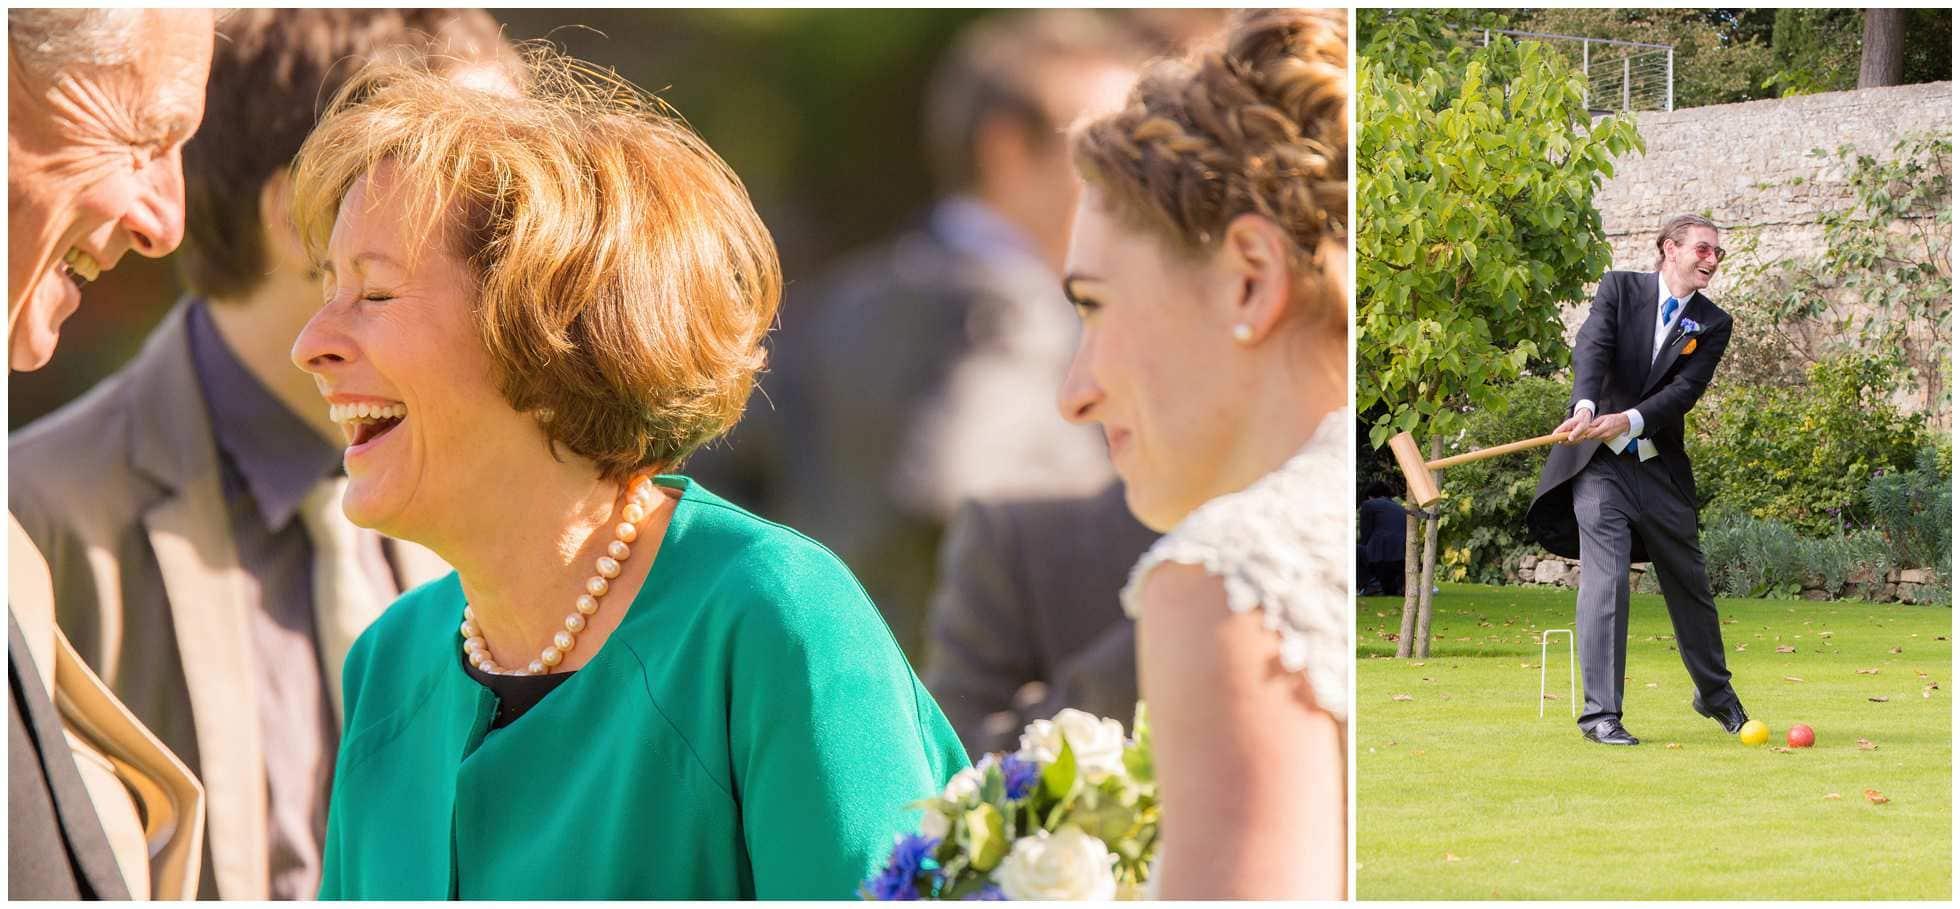 Croquet at a Christ Church College Wedding Photographer's dream wedding